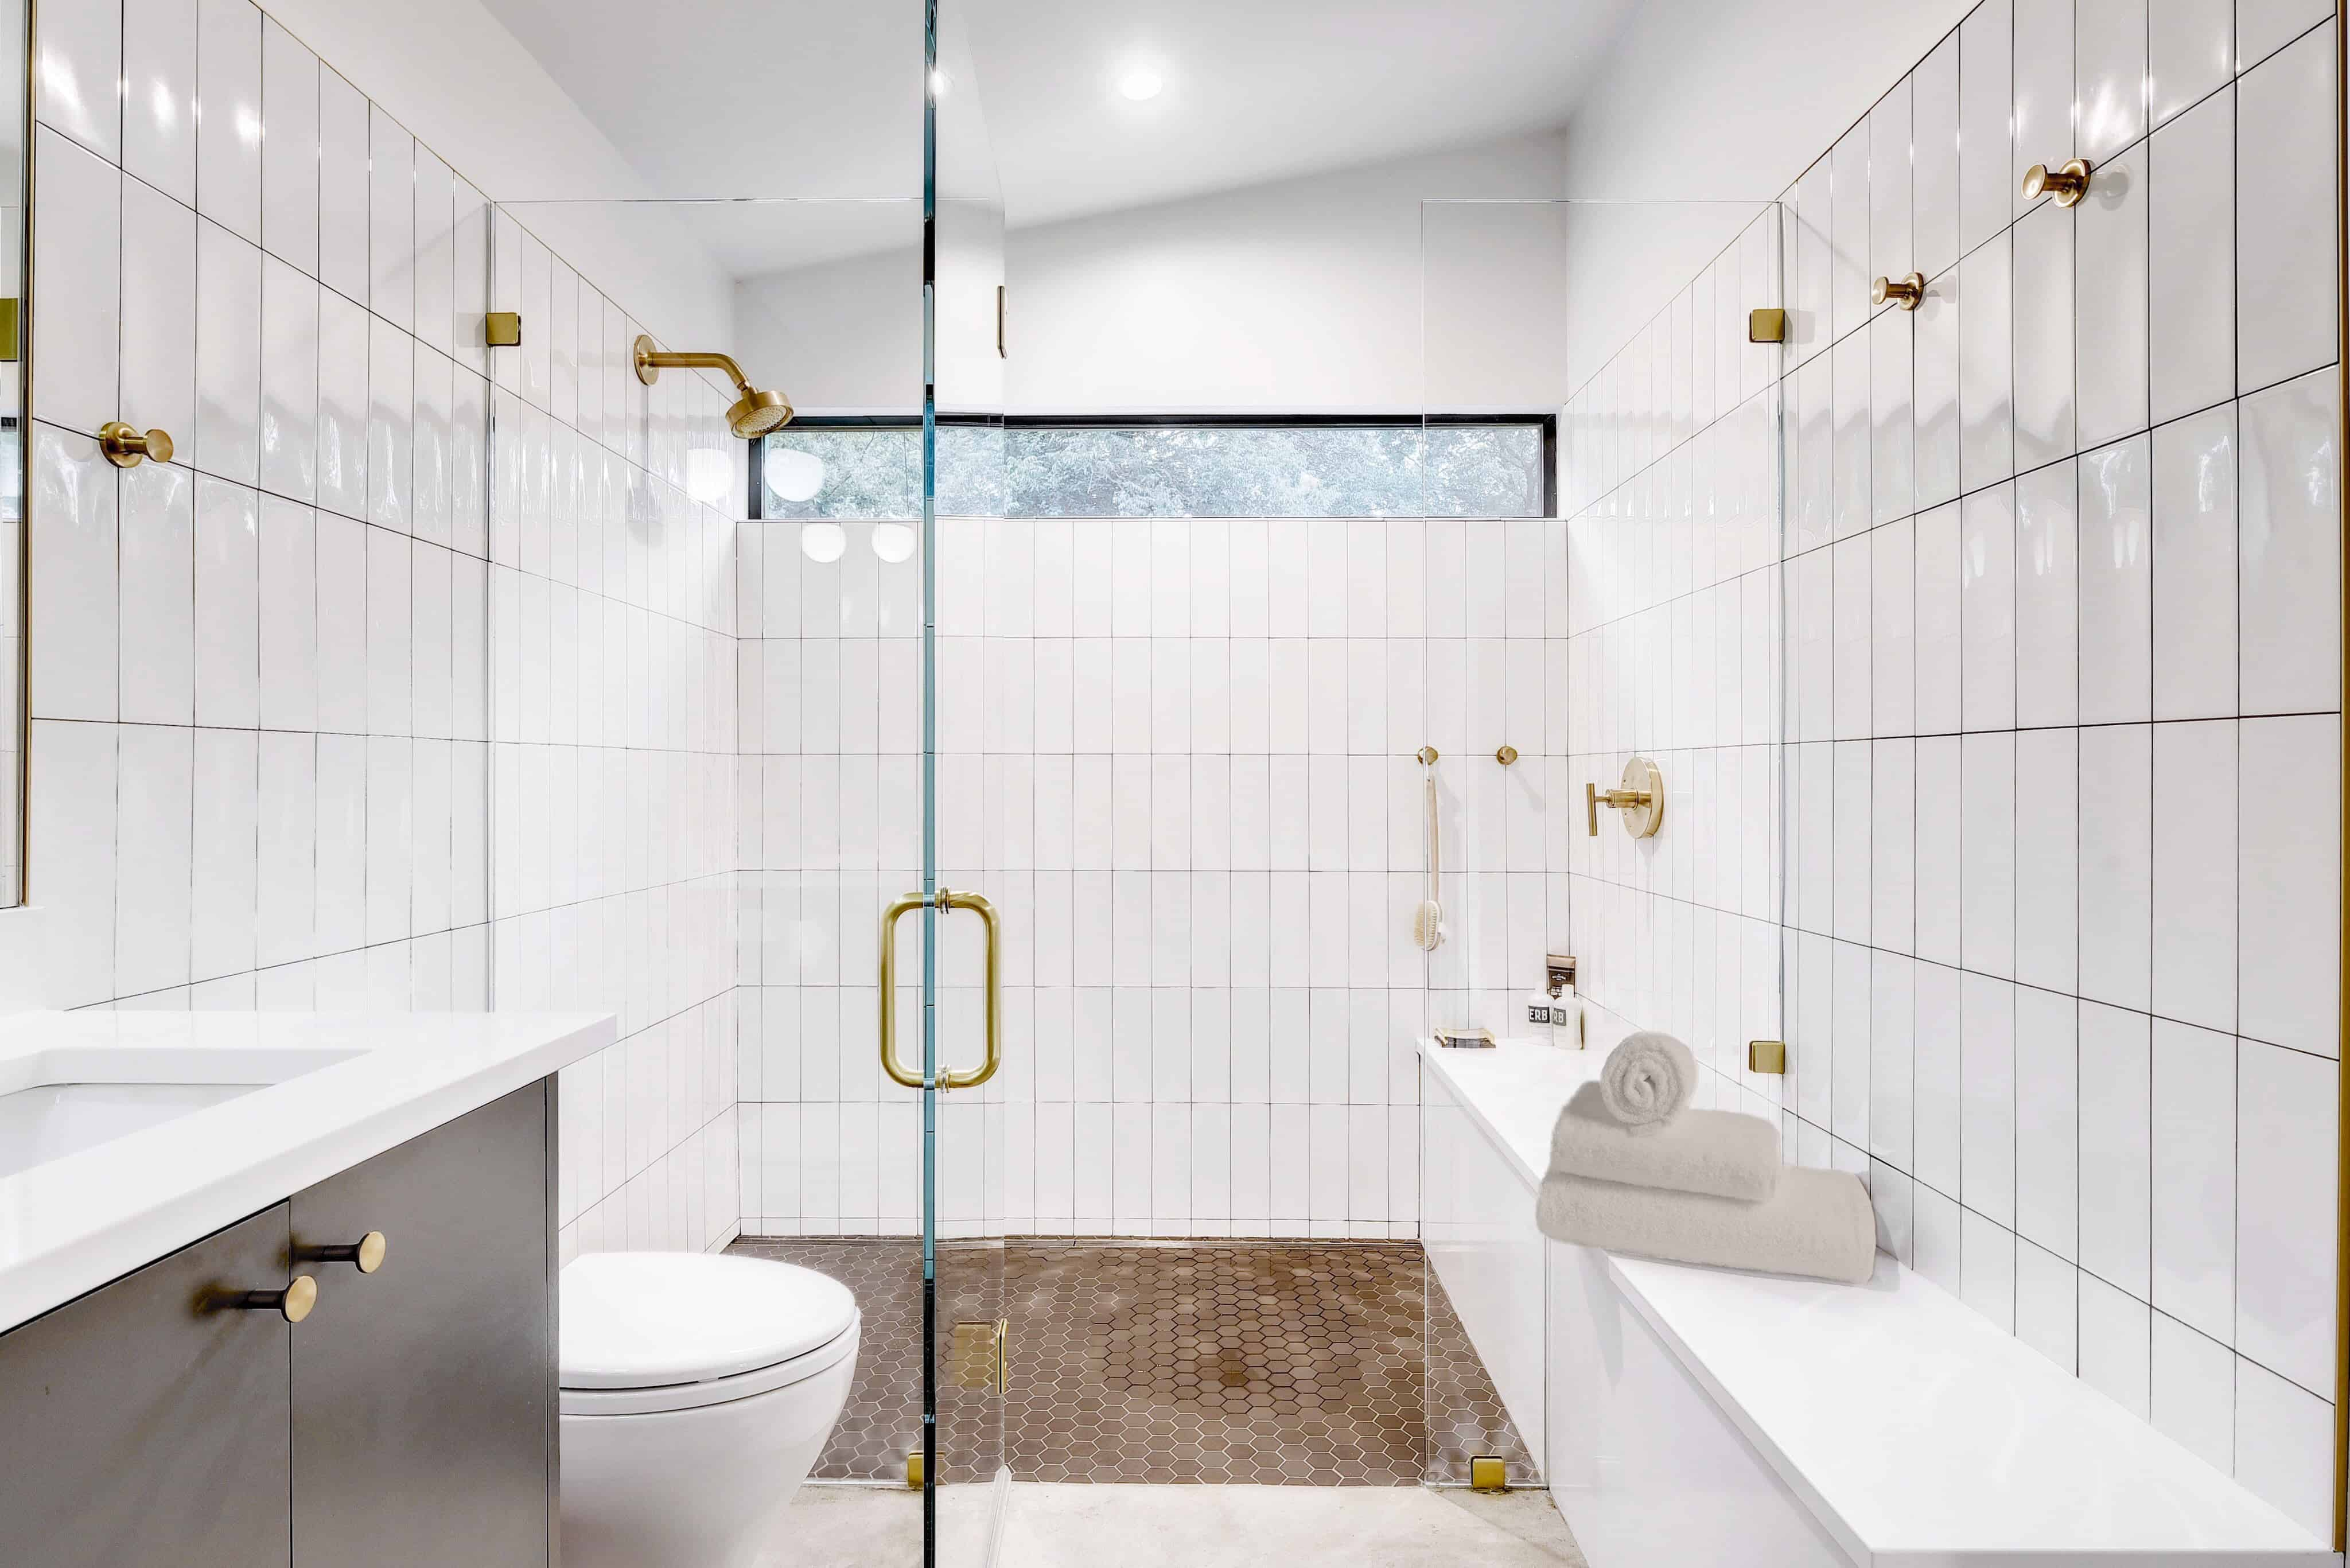 Bathroom in the Re-Open House designed by Matt Fajkus Architecture.